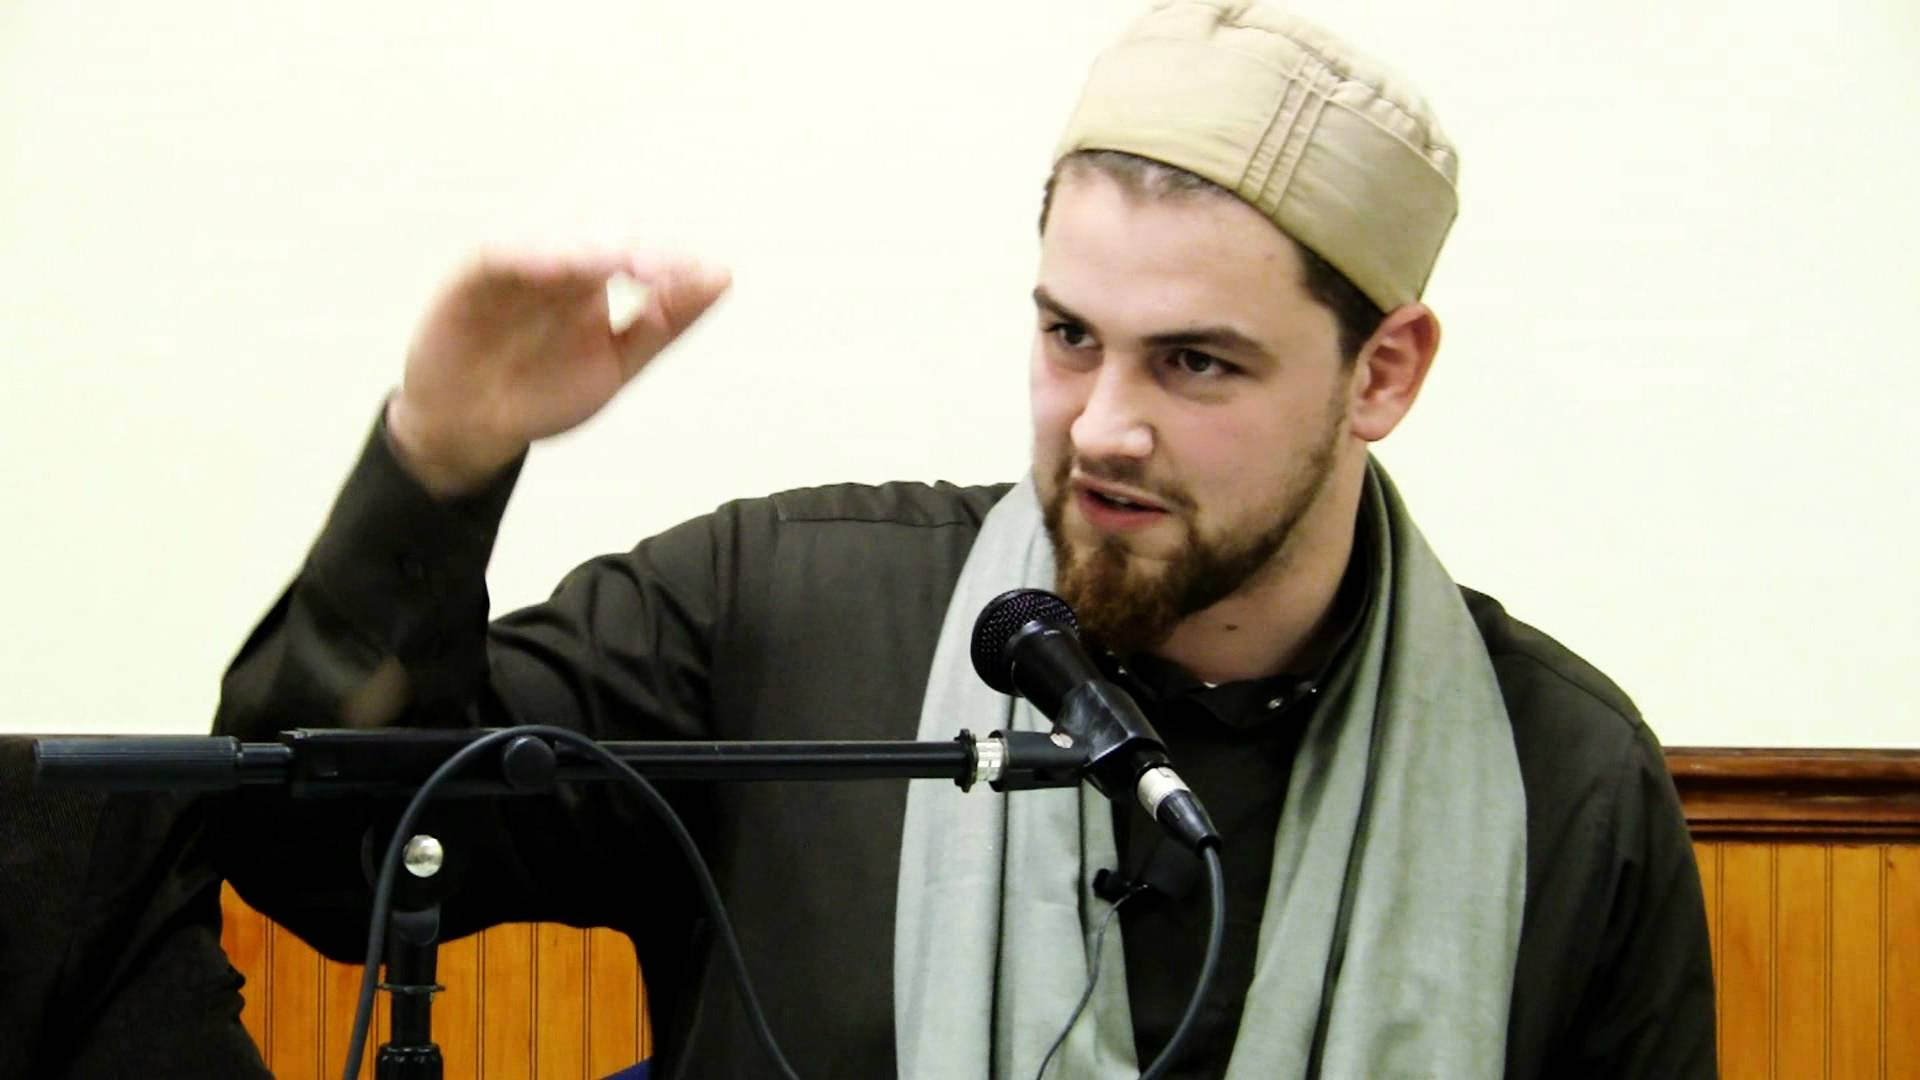 10 Muslim Speakers Making it Count on YouTube